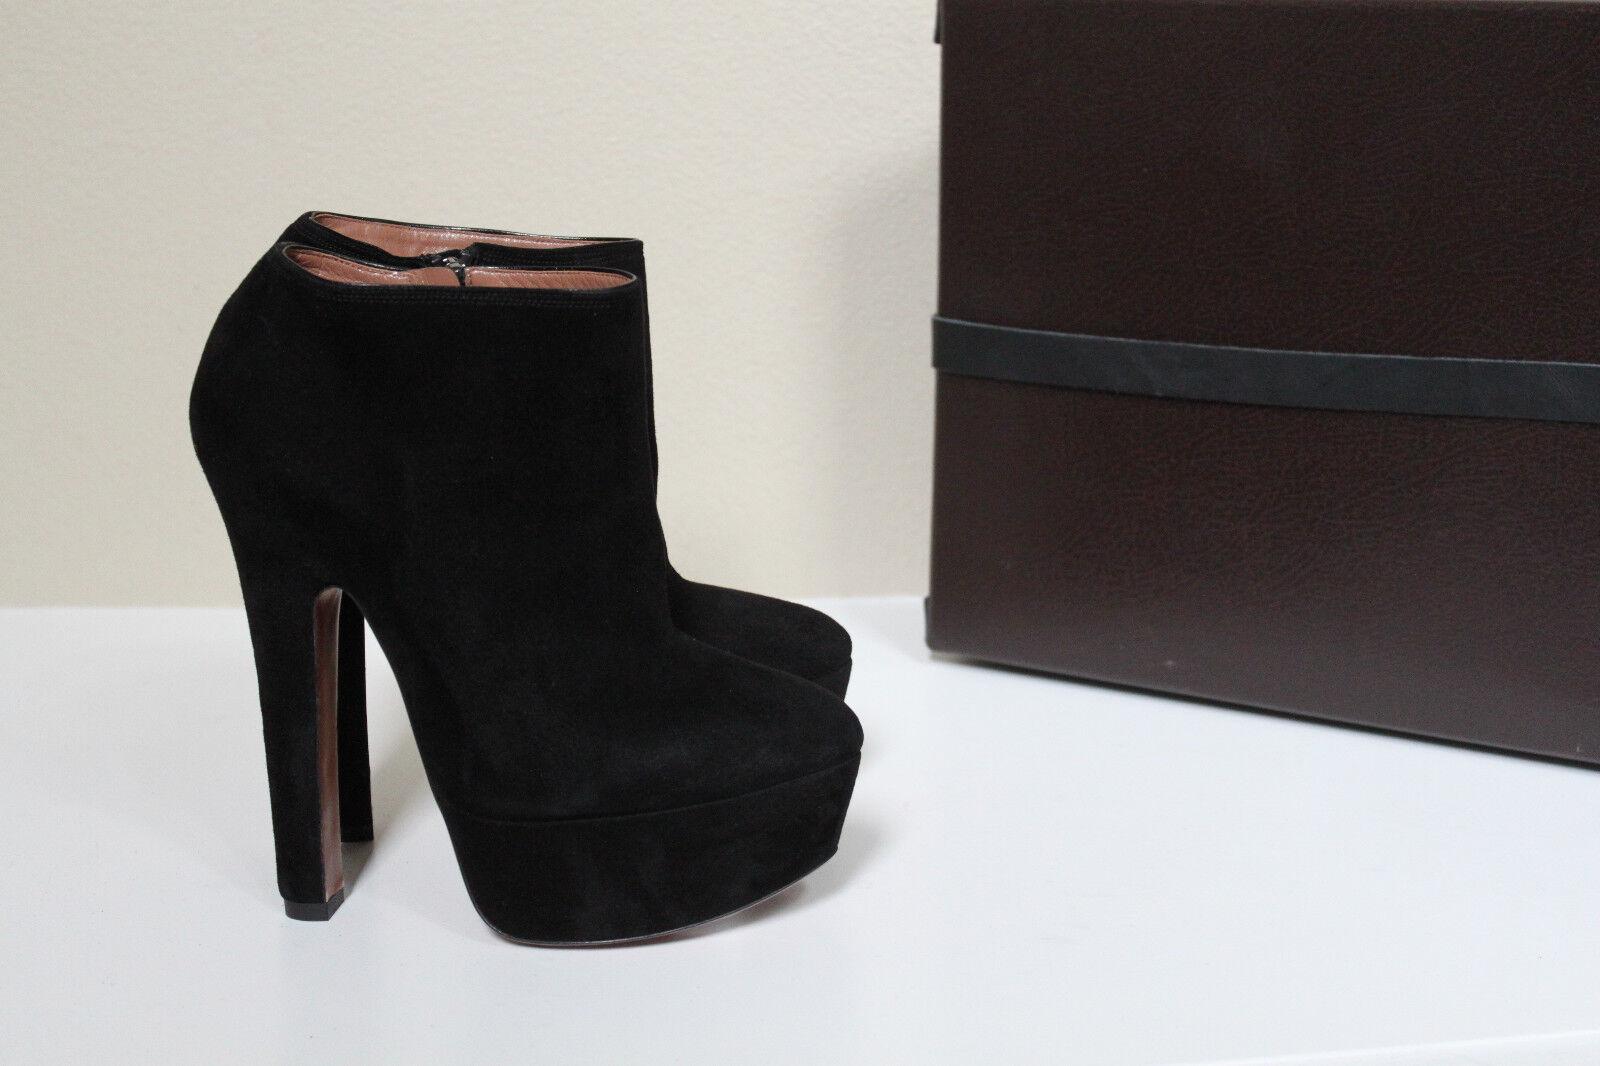 New sz 11 / 41 Azzedine Alaia Black Suede Platform Ankle Bootie Heel Shoes